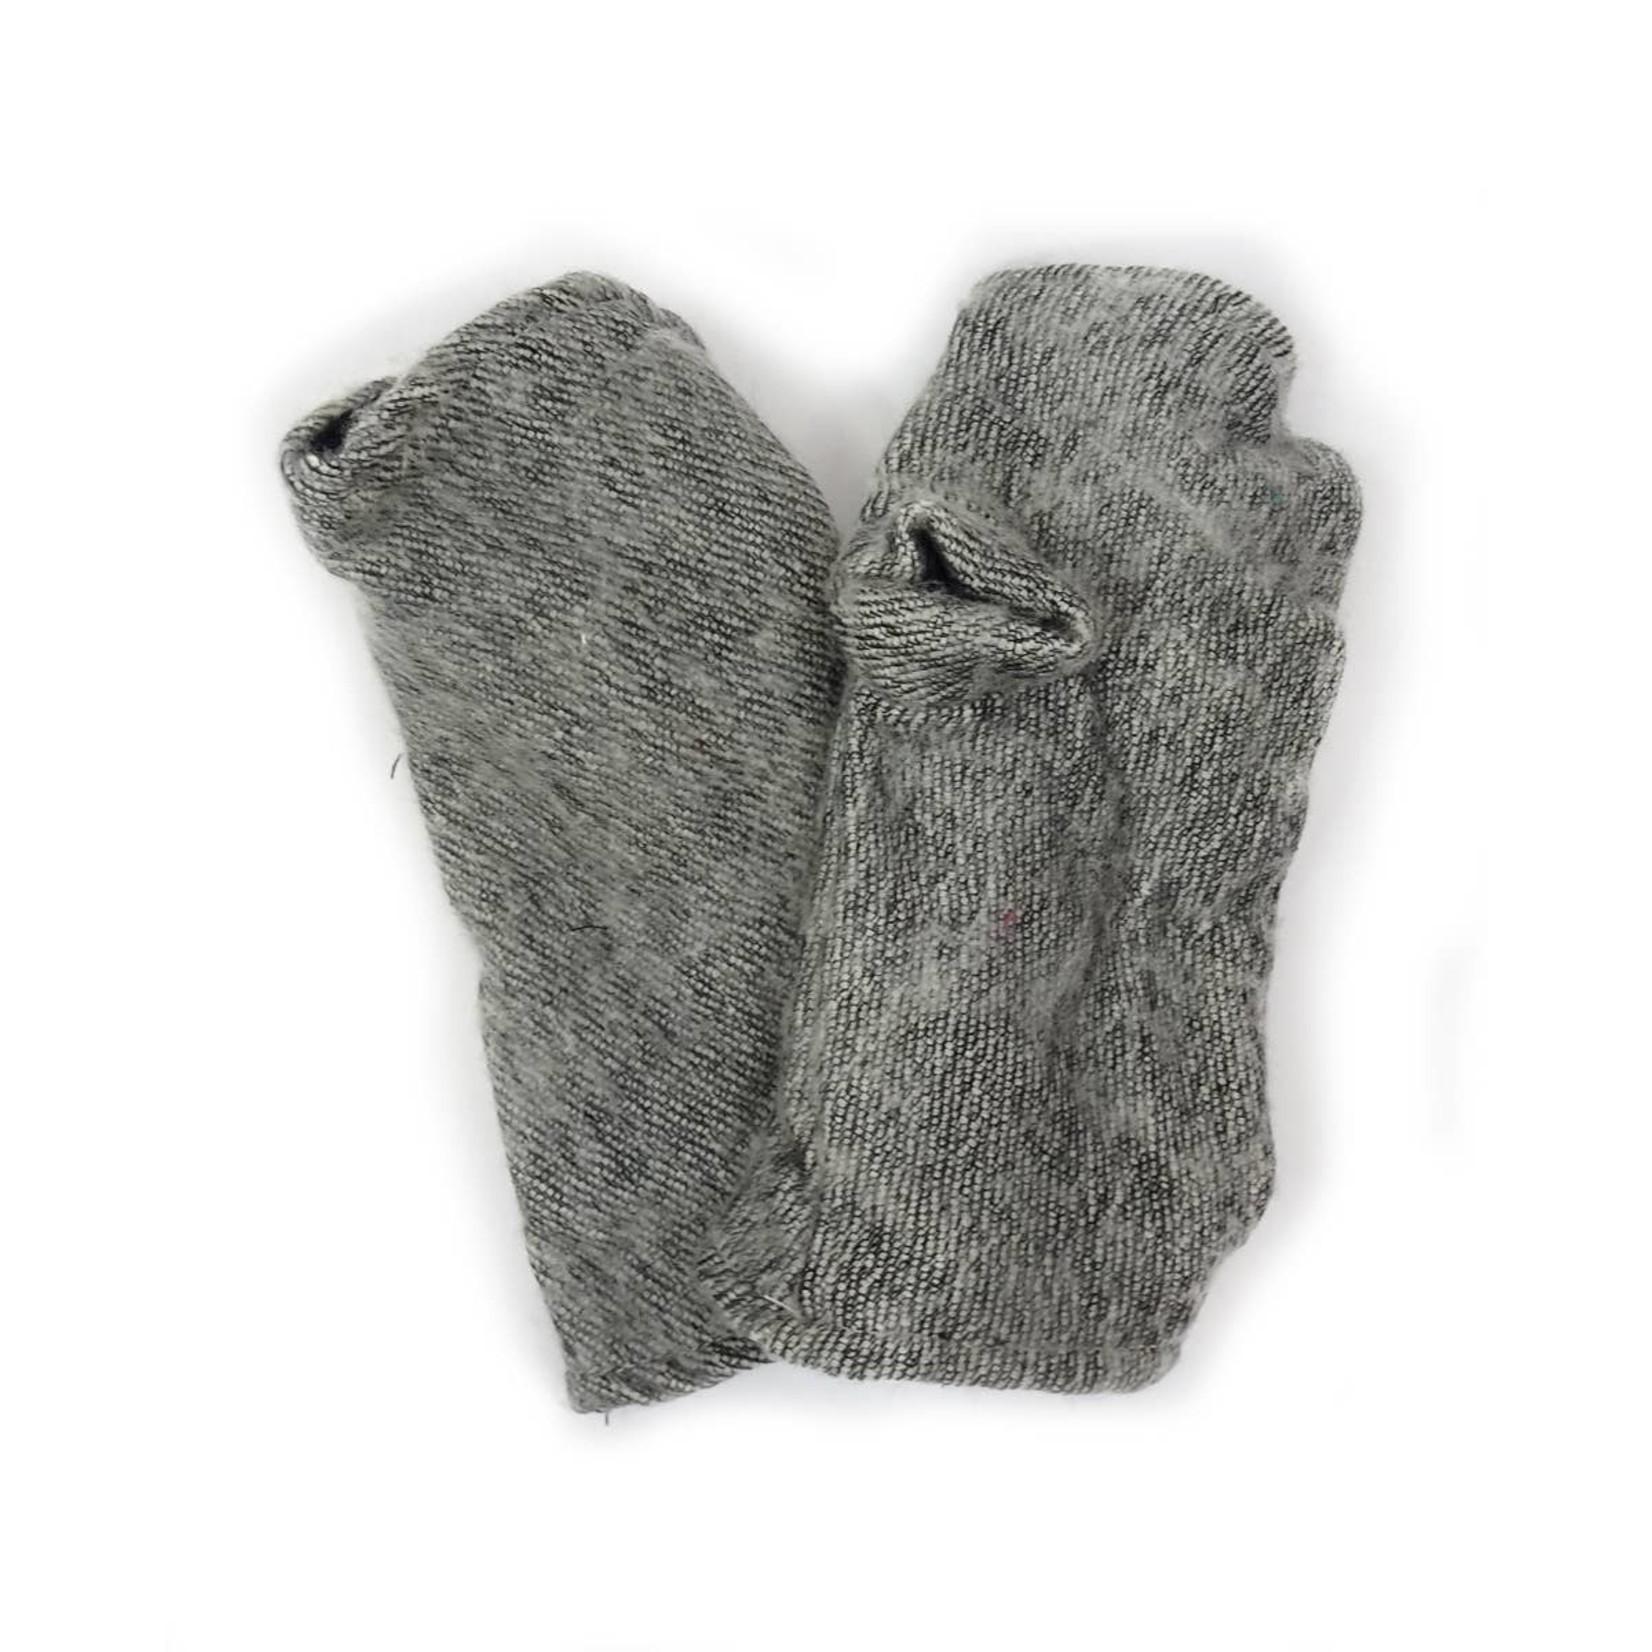 Zig Zag Asian Brushed Woven Fingerless Gloves in Frost